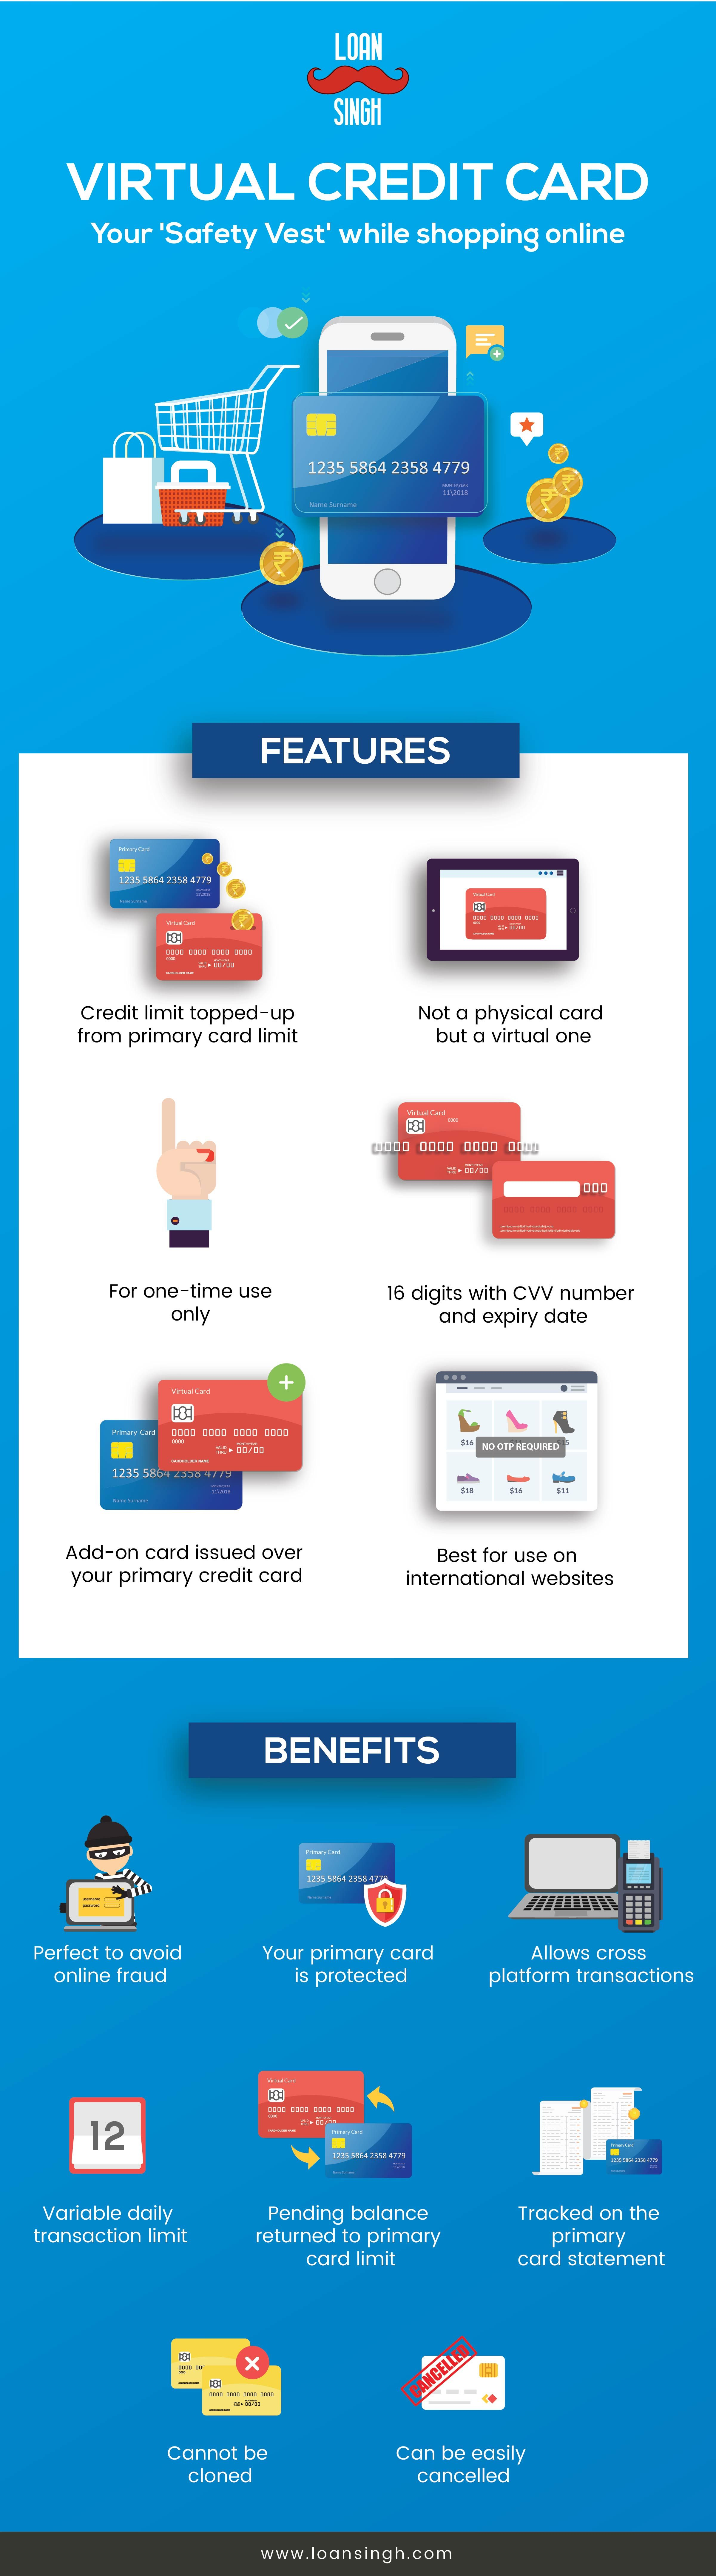 Loan Singh Is A Digital Lending Platform That Provides Small Loans Cheap Loans Quick Loan Best Personal Loan Personal Loans Virtual Credit Card Medical Loans